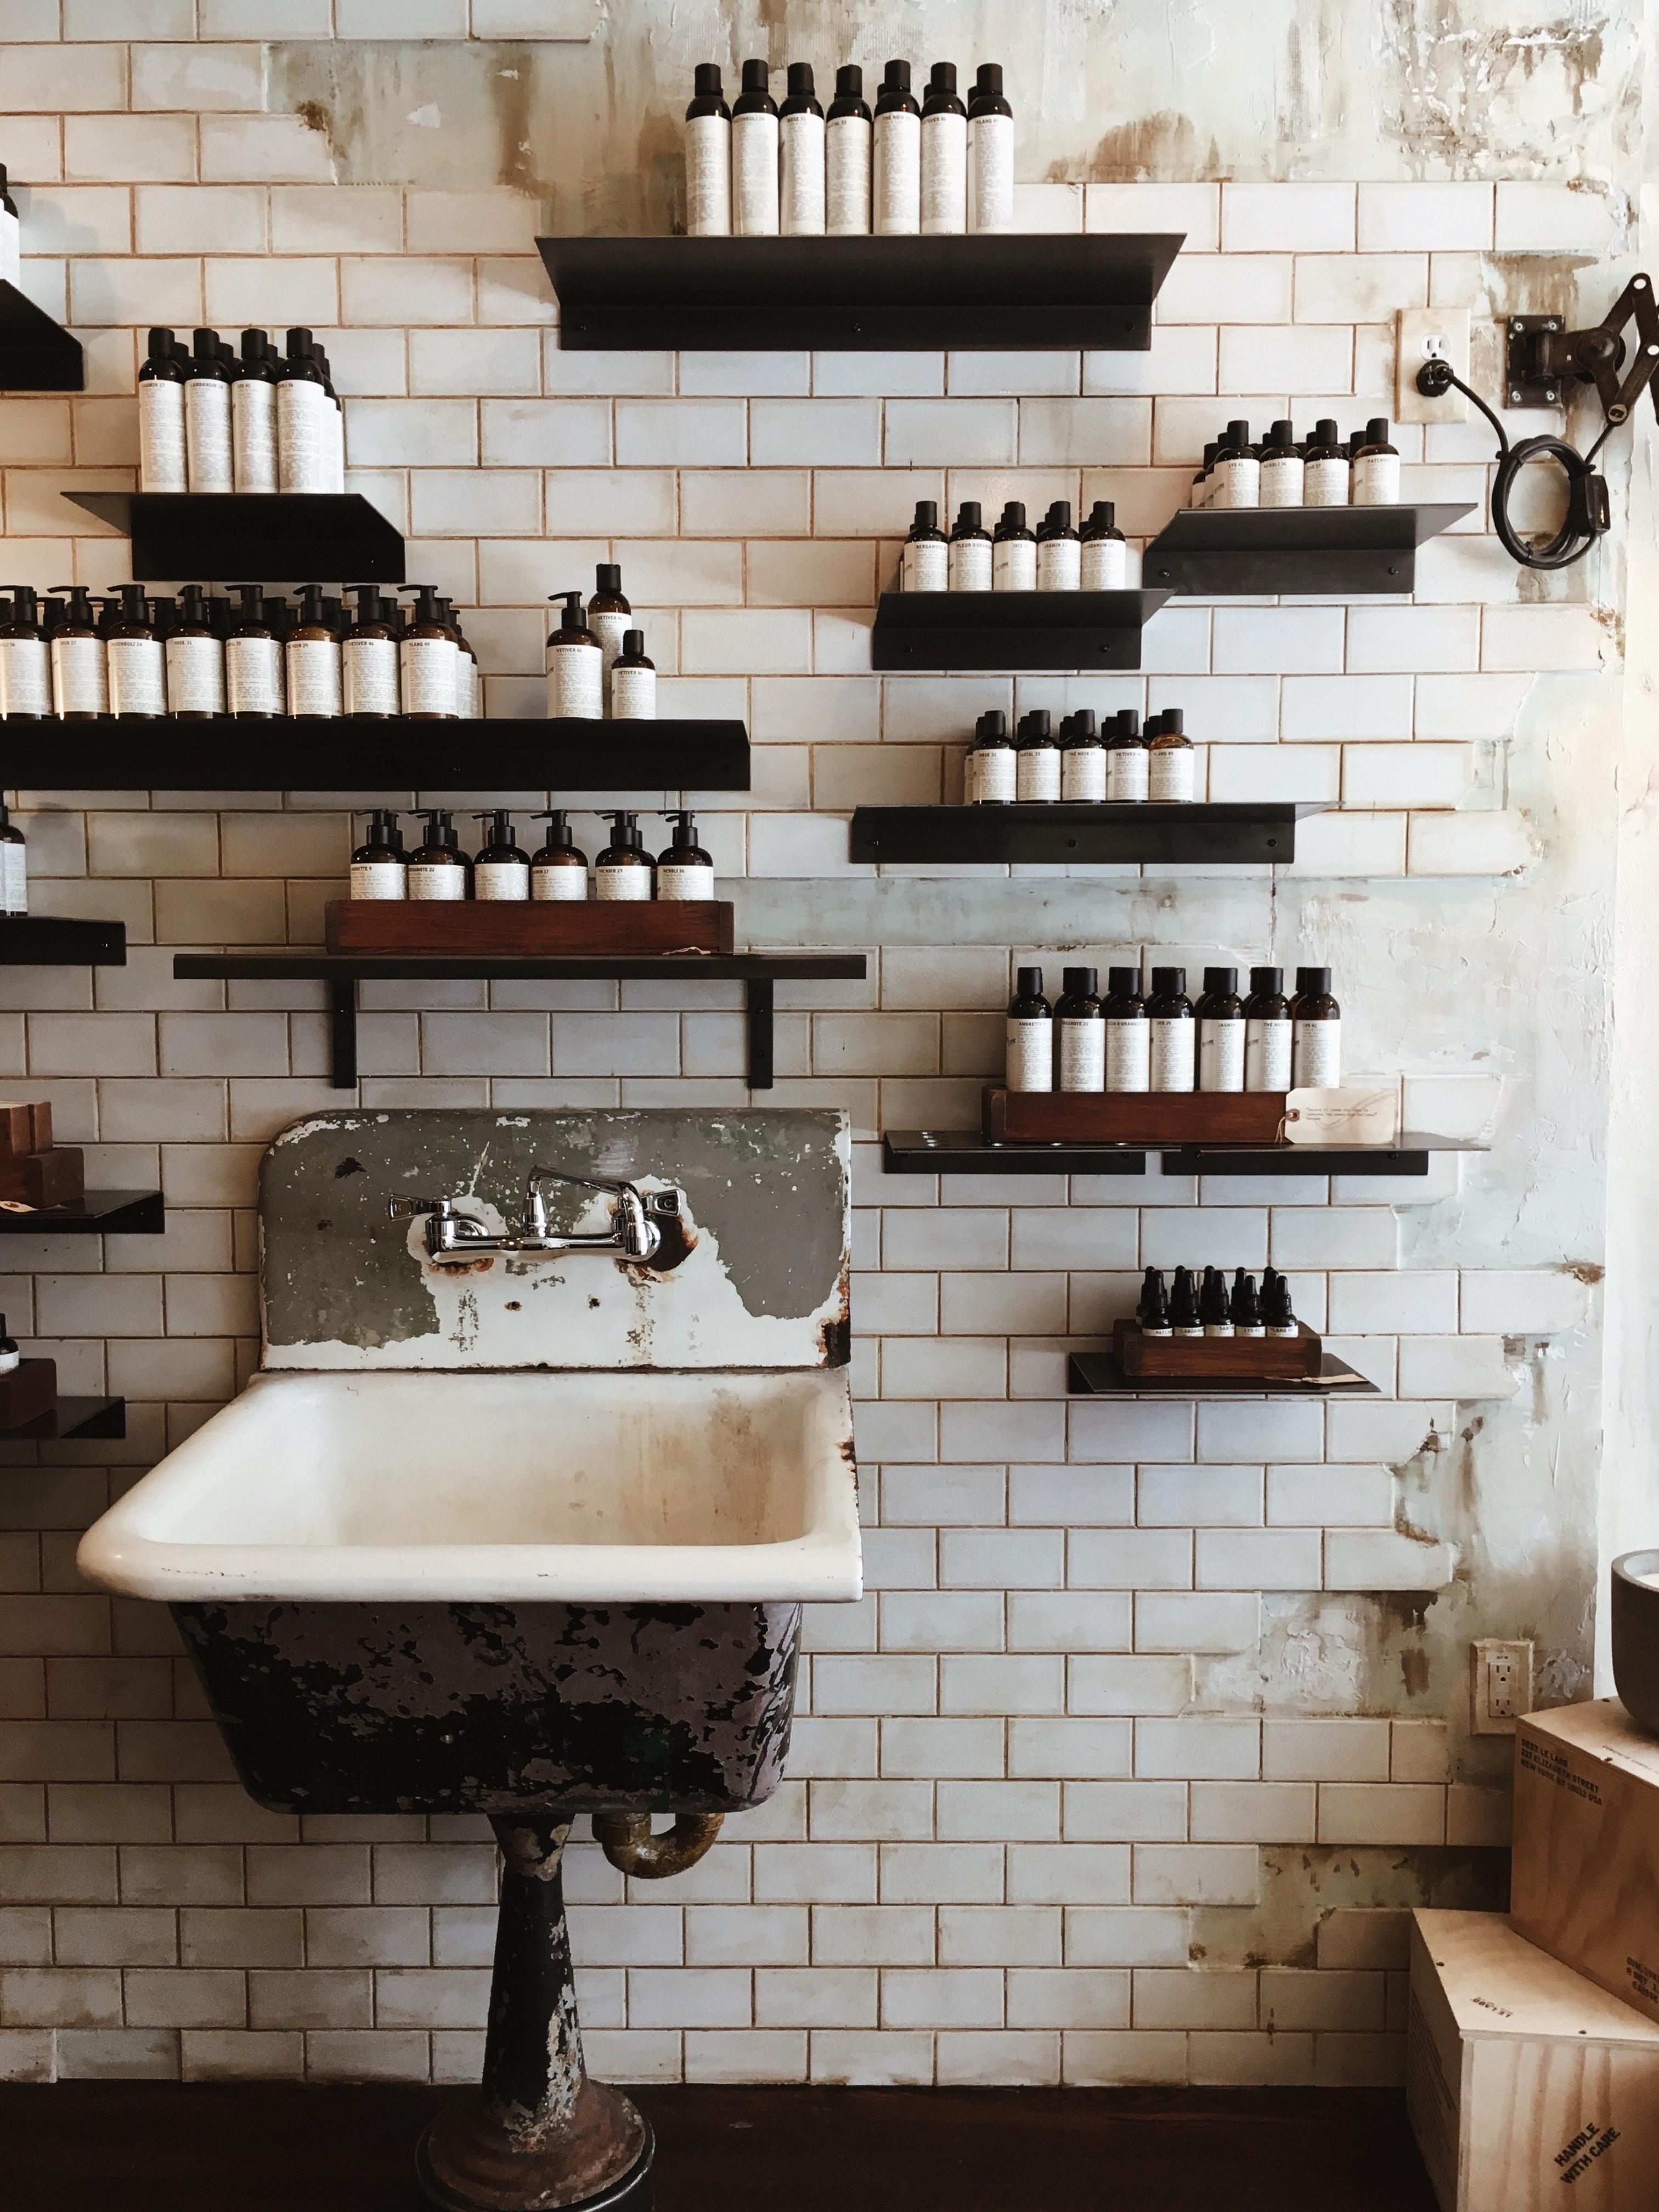 bottles on wall shelves above sink